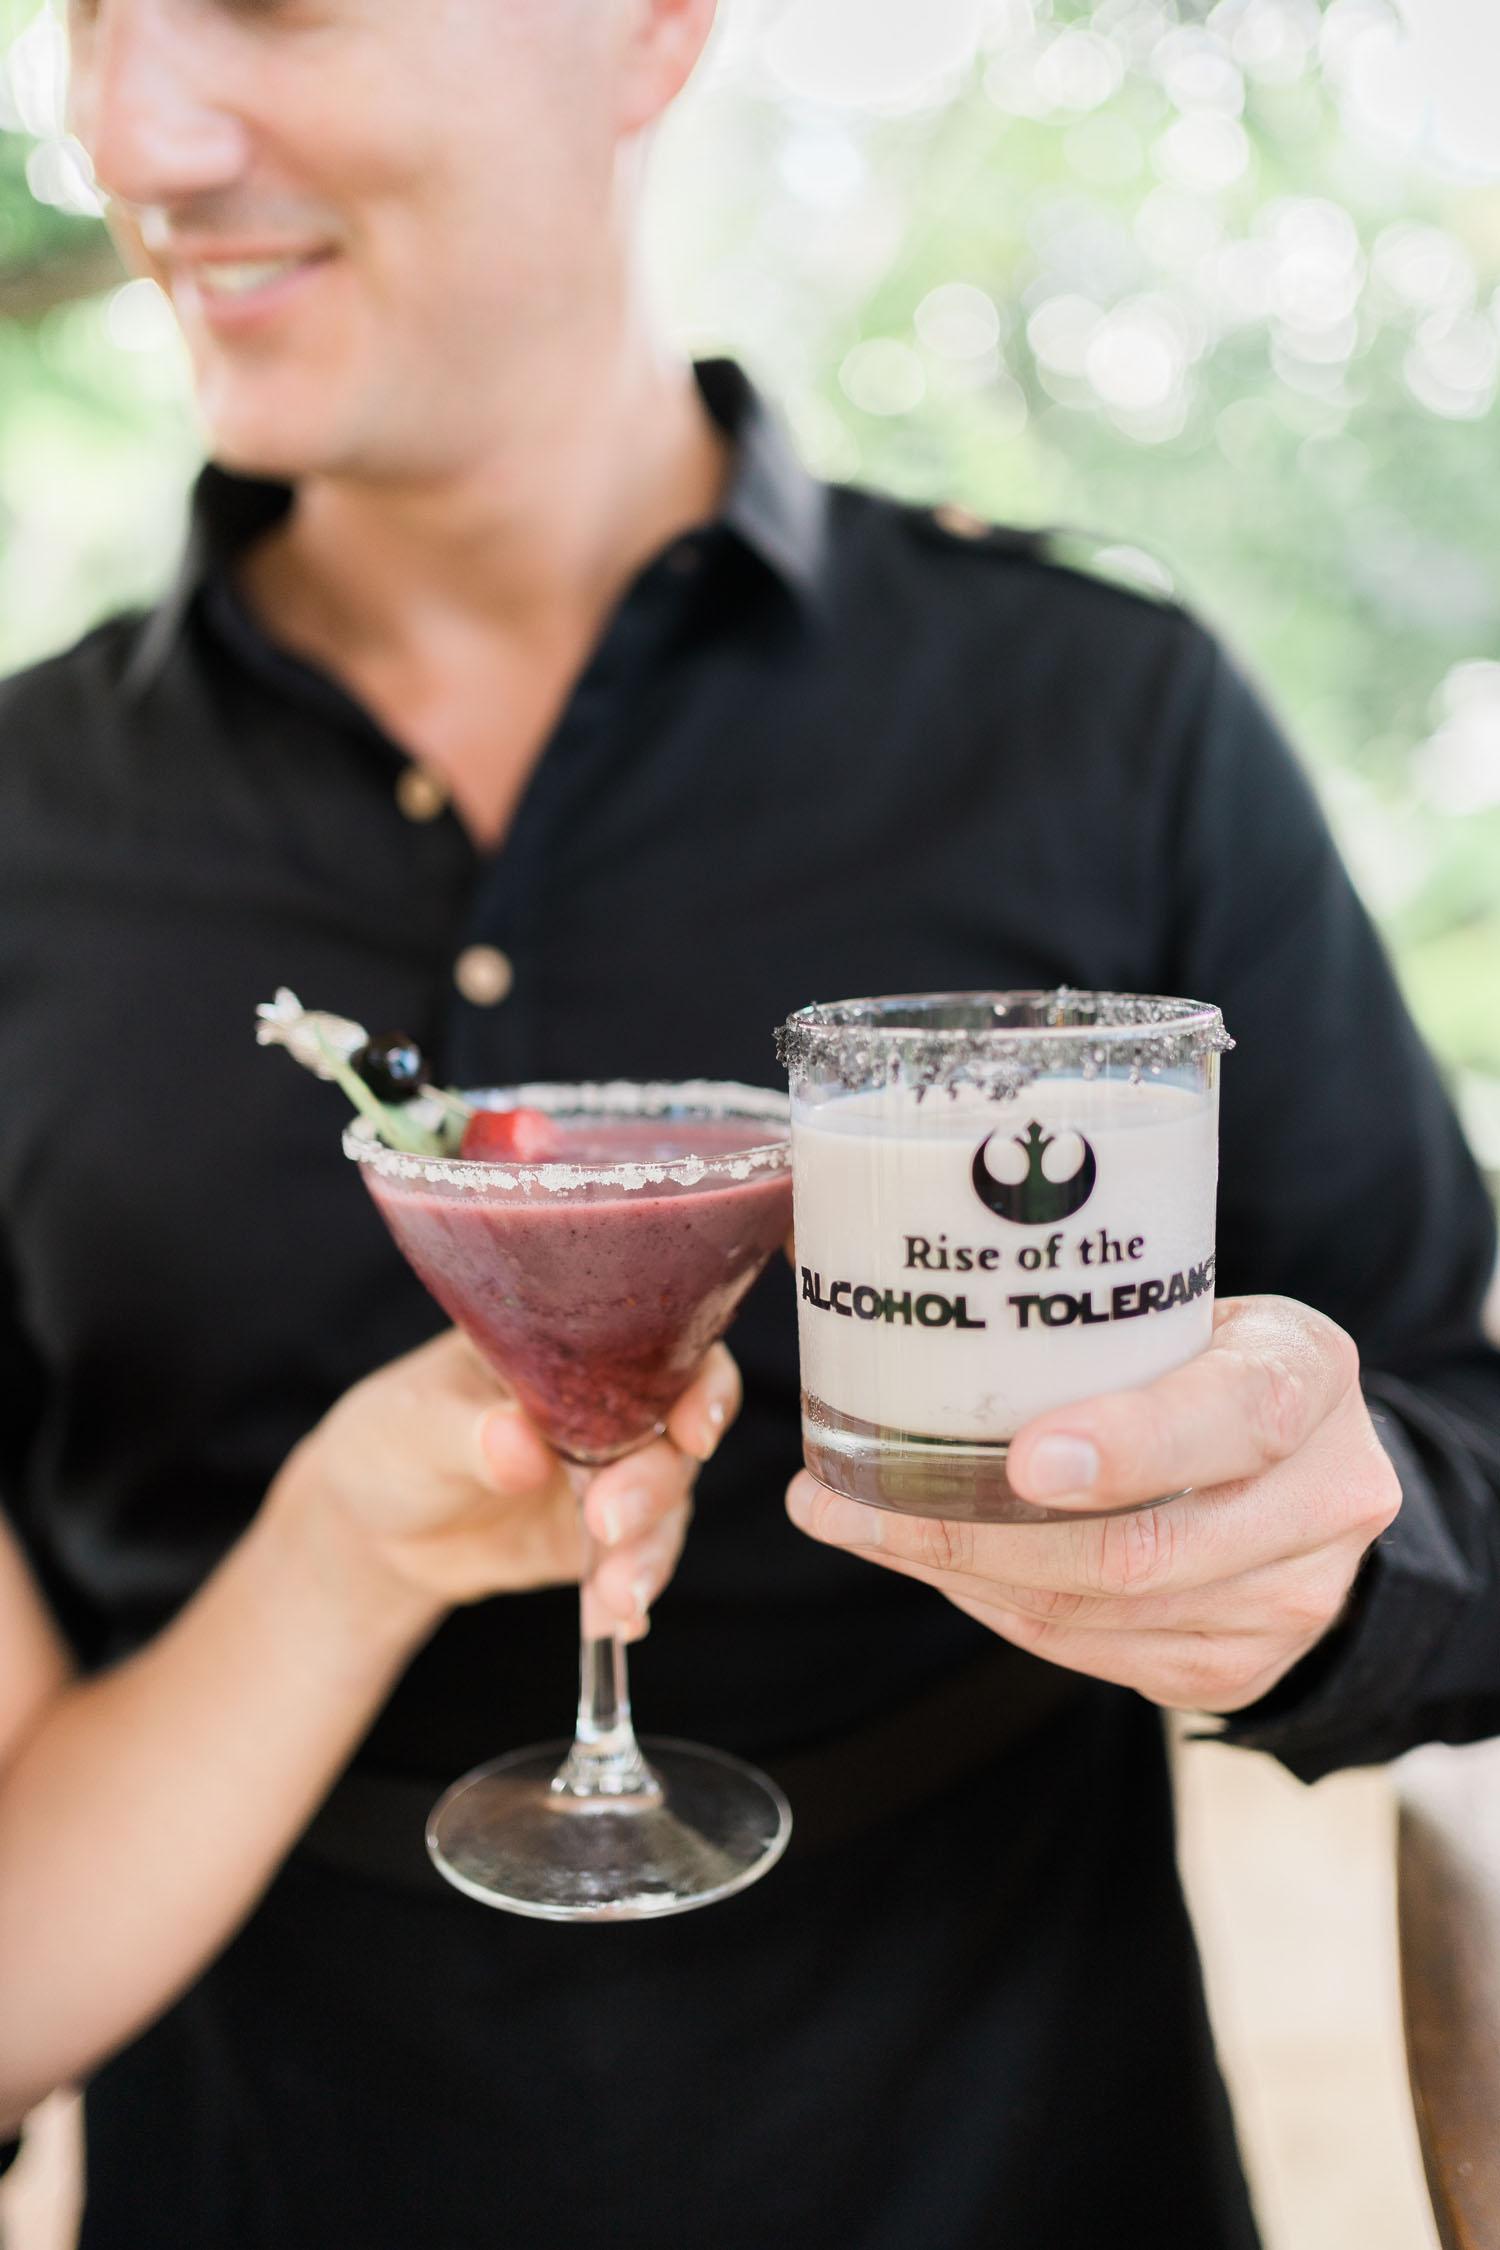 Star Wars cocktail glasses